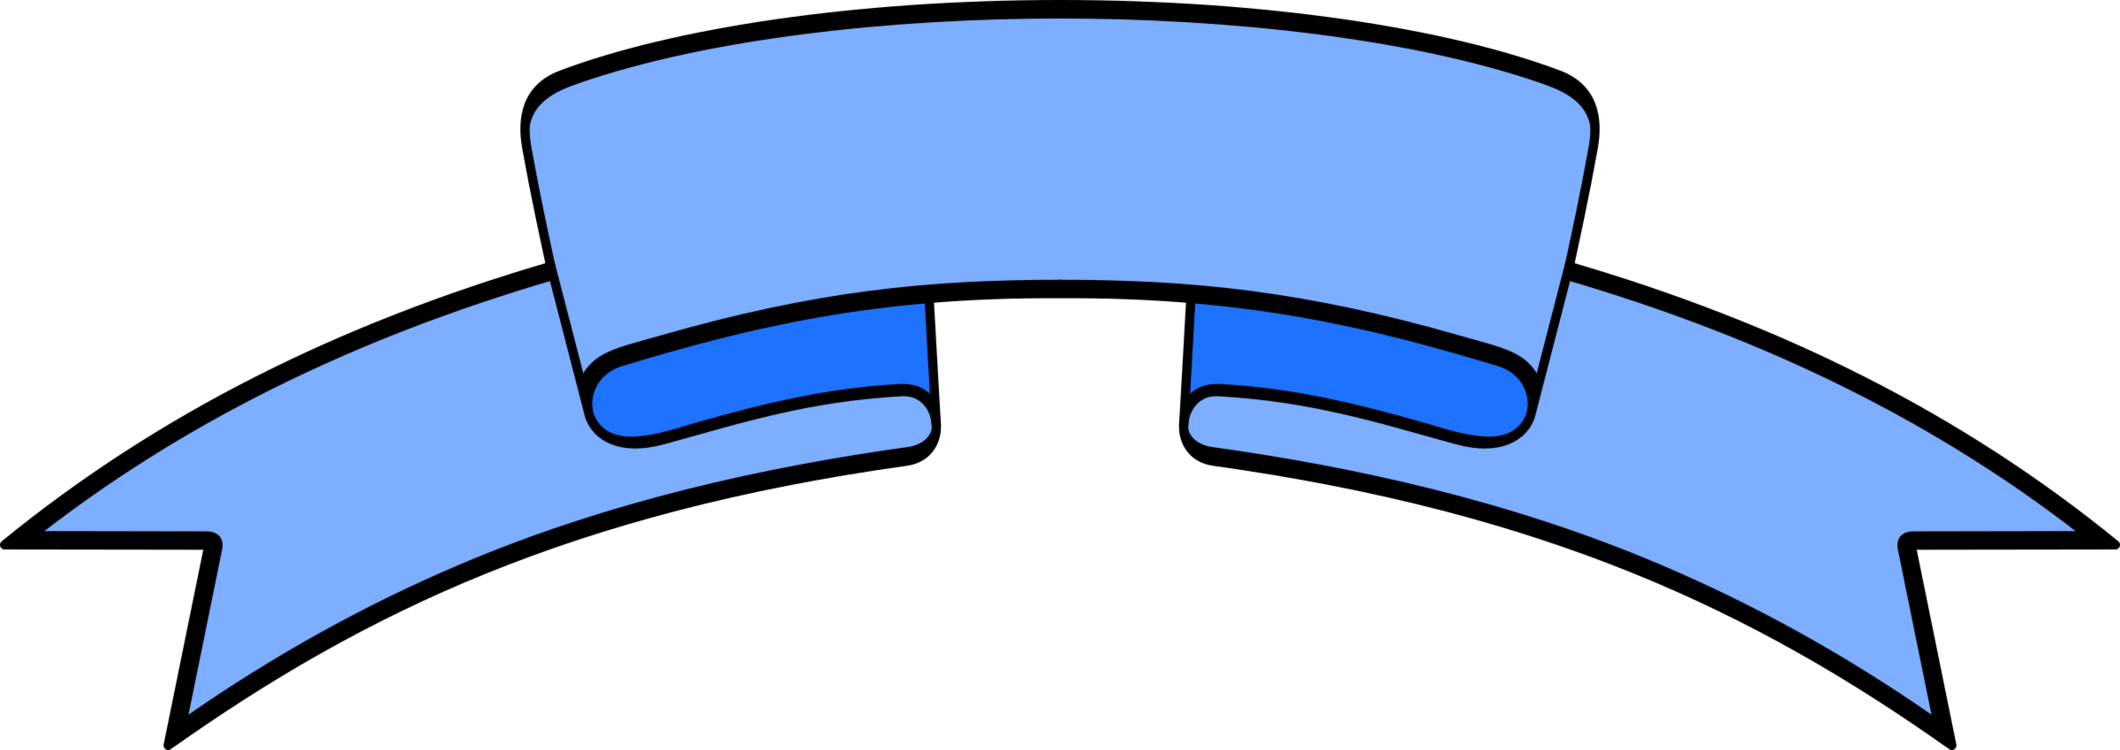 Auto Part,Automotive Mirror,Automotive Sideview Mirror